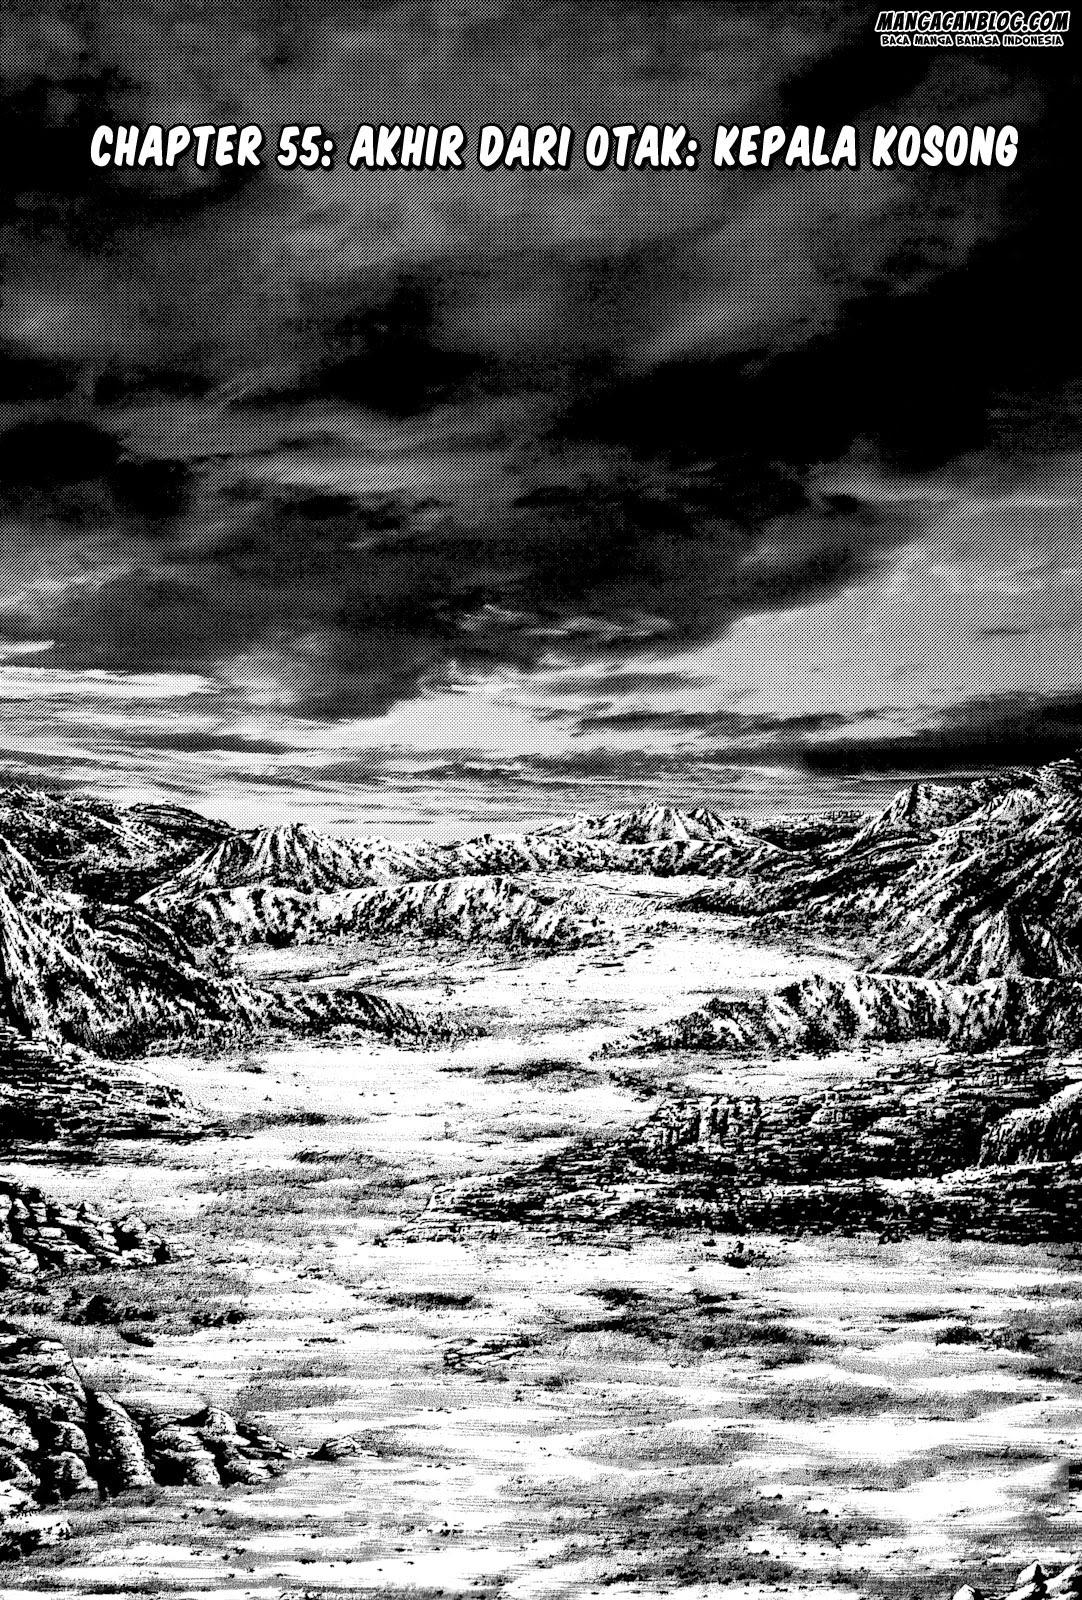 Dilarang COPAS - situs resmi www.mangacanblog.com - Komik terra formars vol 2 055 - kepala kosong 56 Indonesia terra formars vol 2 055 - kepala kosong Terbaru |Baca Manga Komik Indonesia|Mangacan